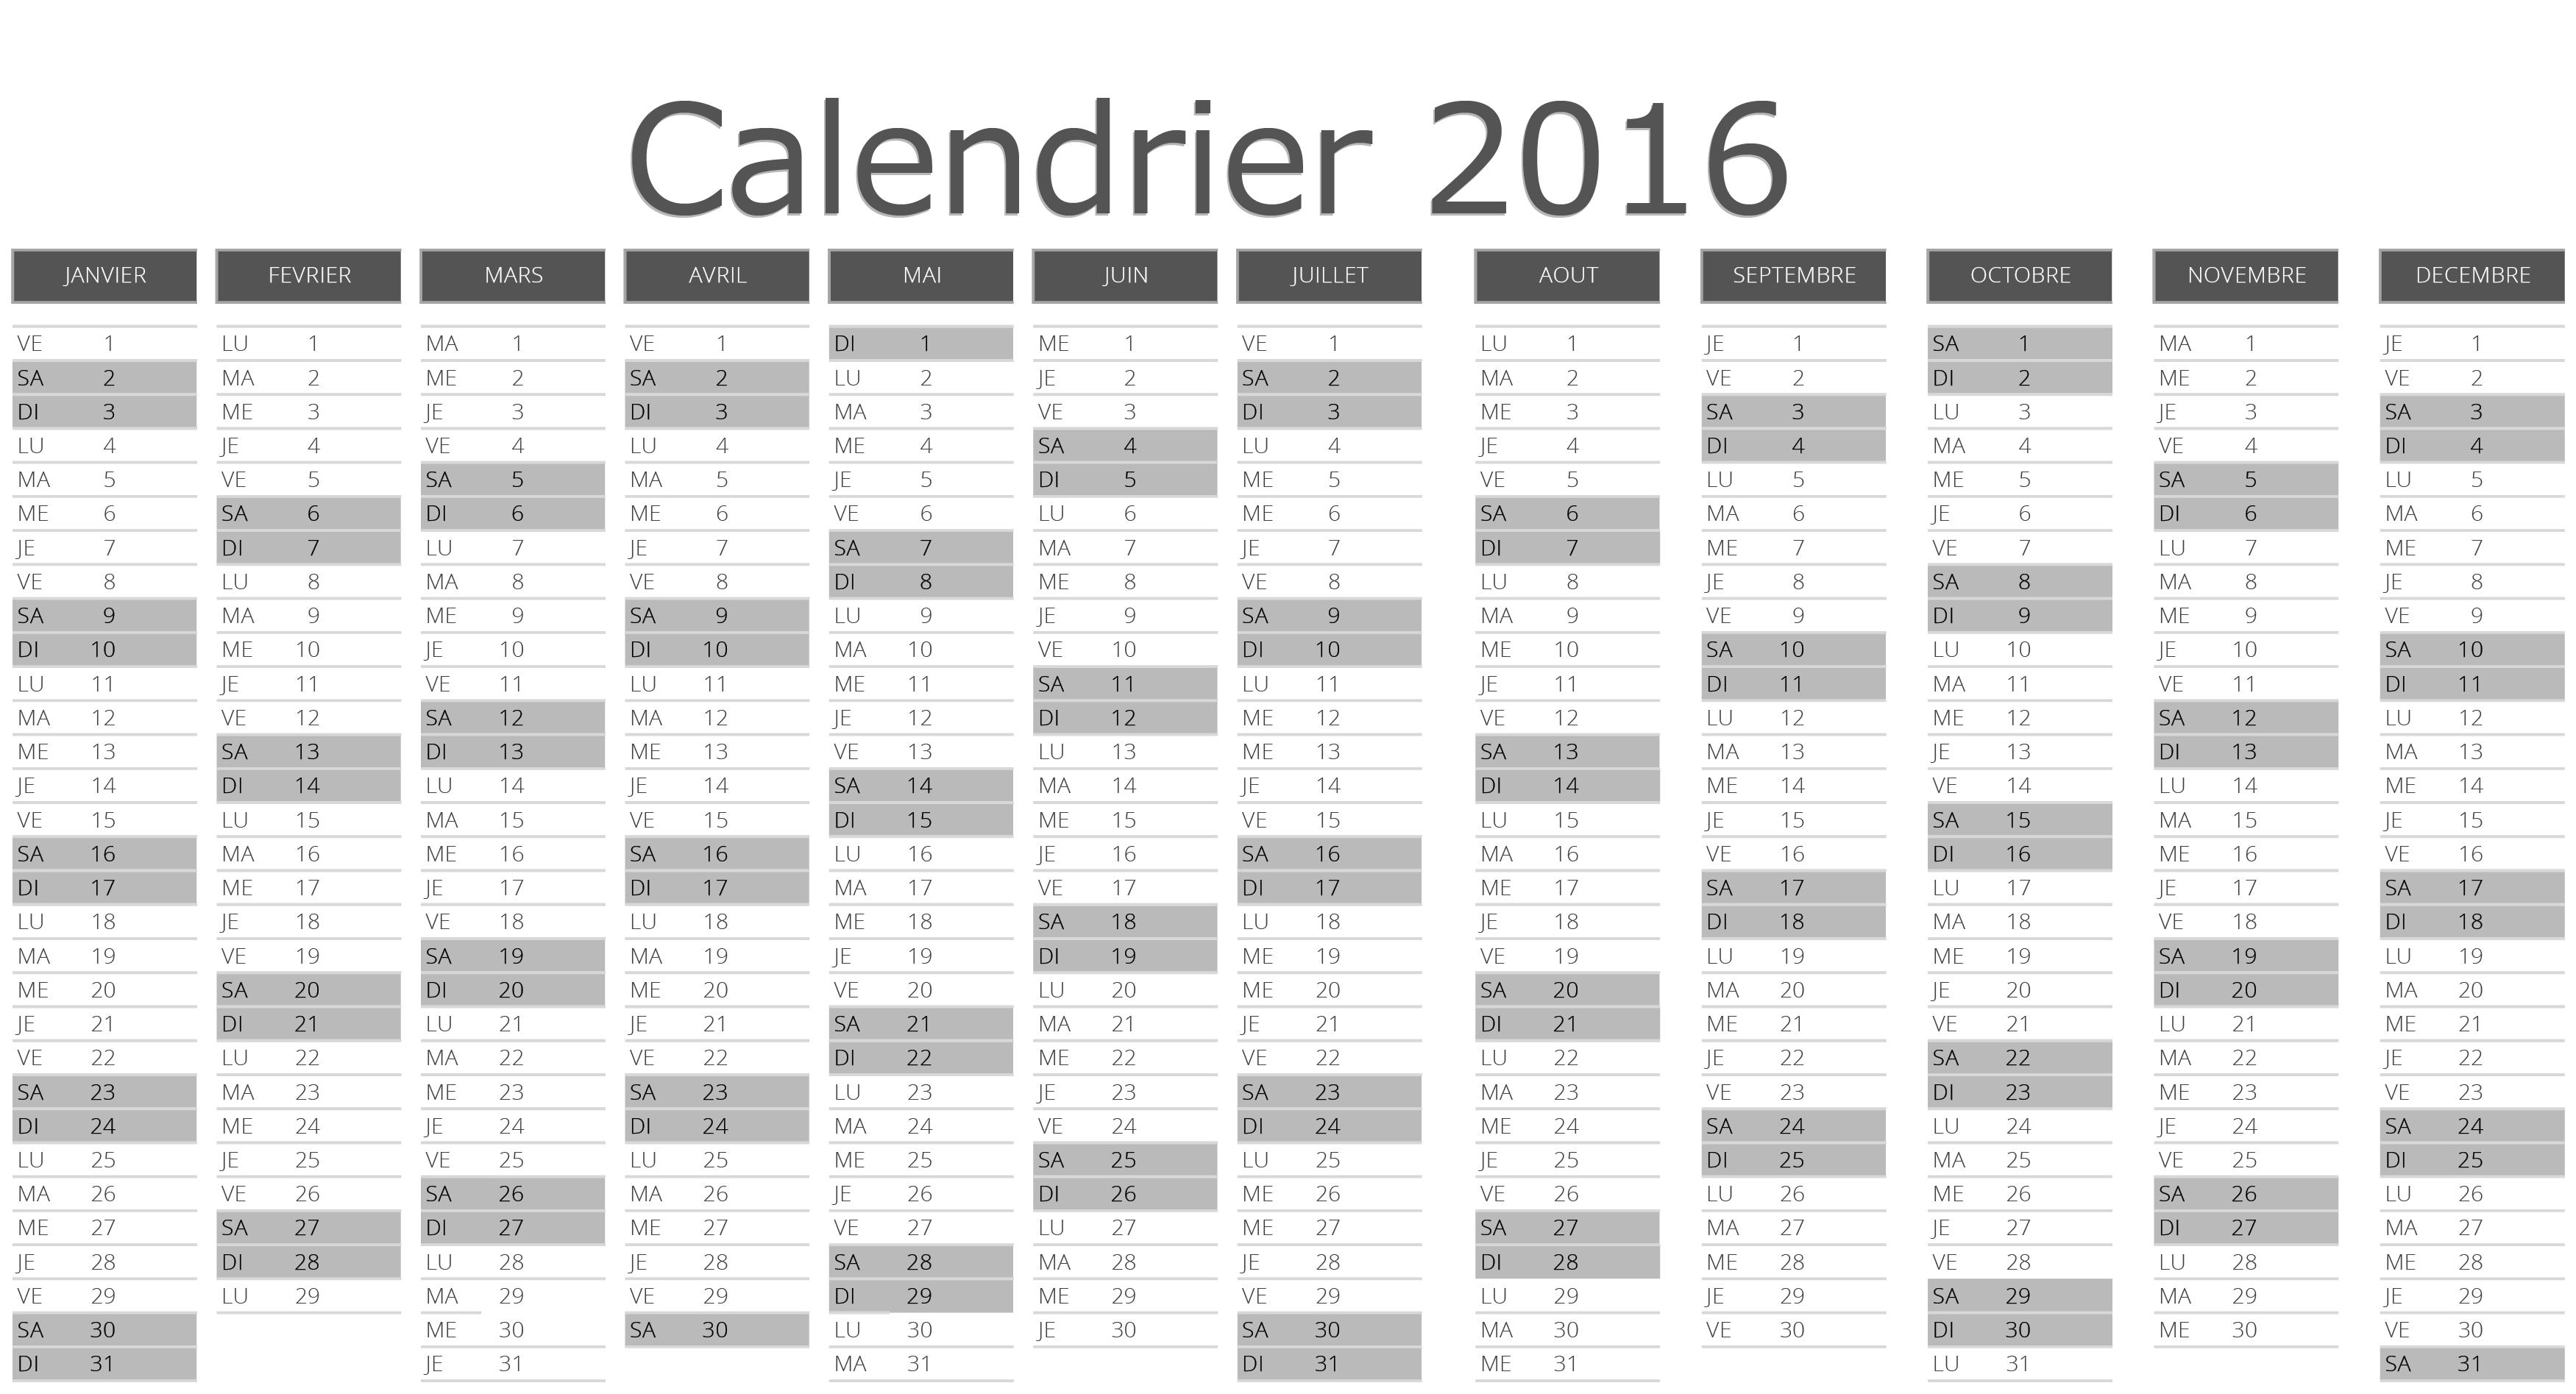 App Planner Calendrier 2016 Excel Et Pdf 224 T 233 L 233 Charger Et Imprimer